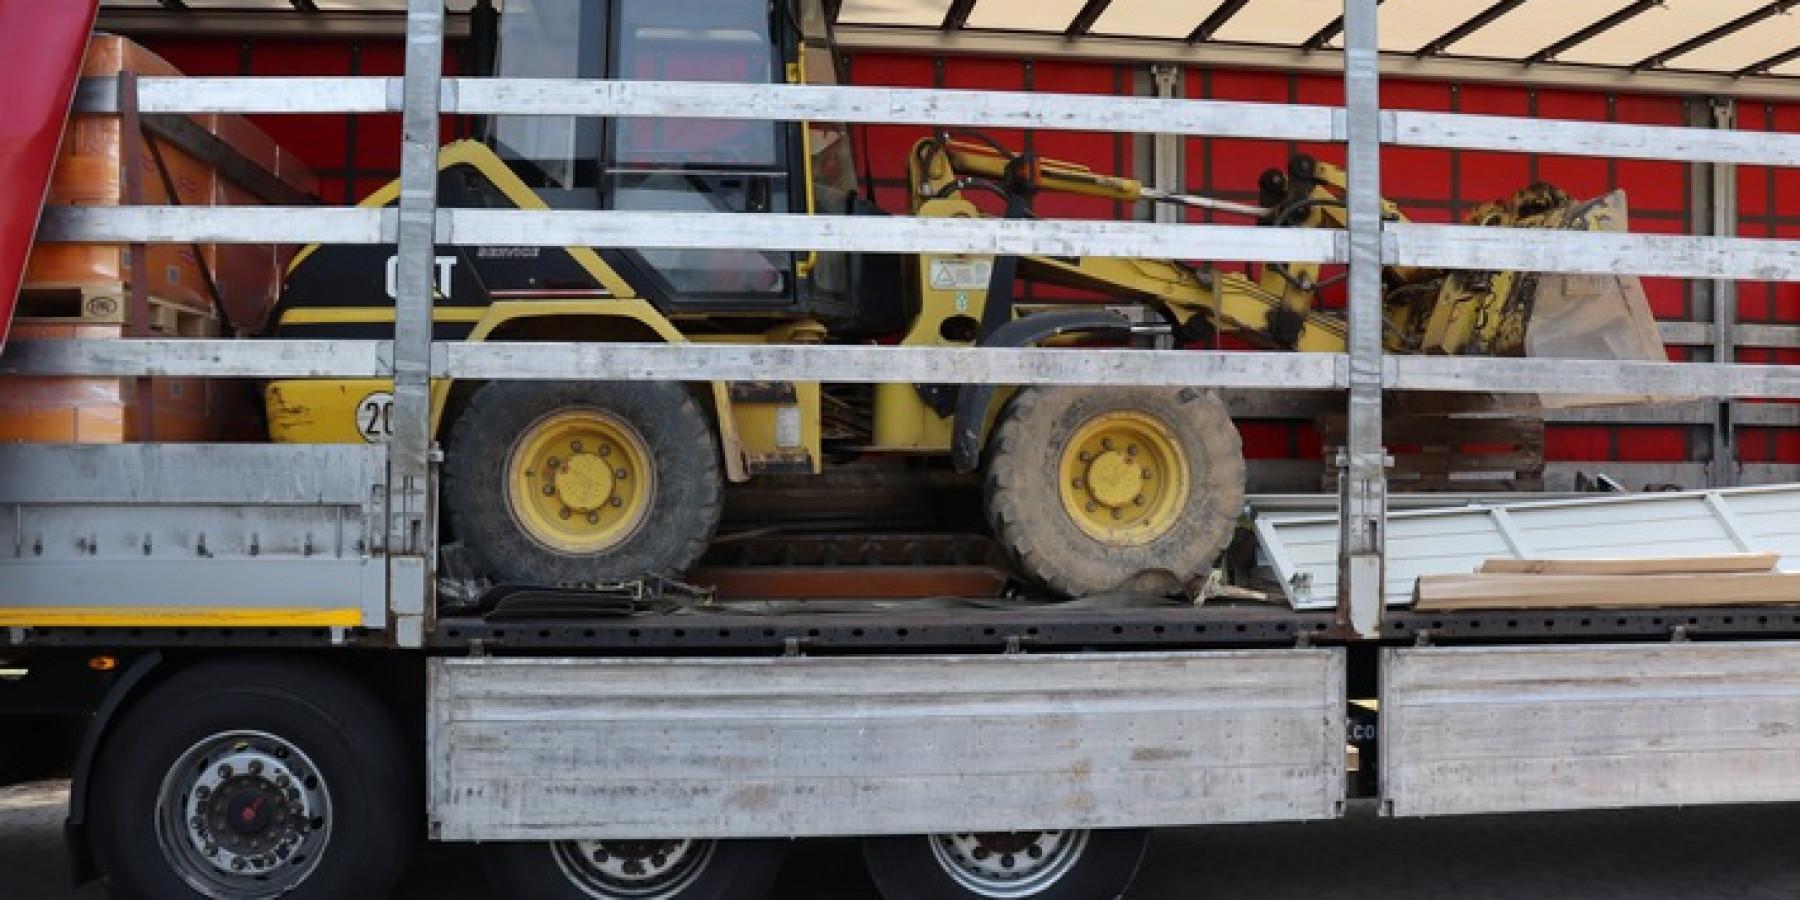 Polizisten stoppen Sattelzug mit gestohlenem Radlader